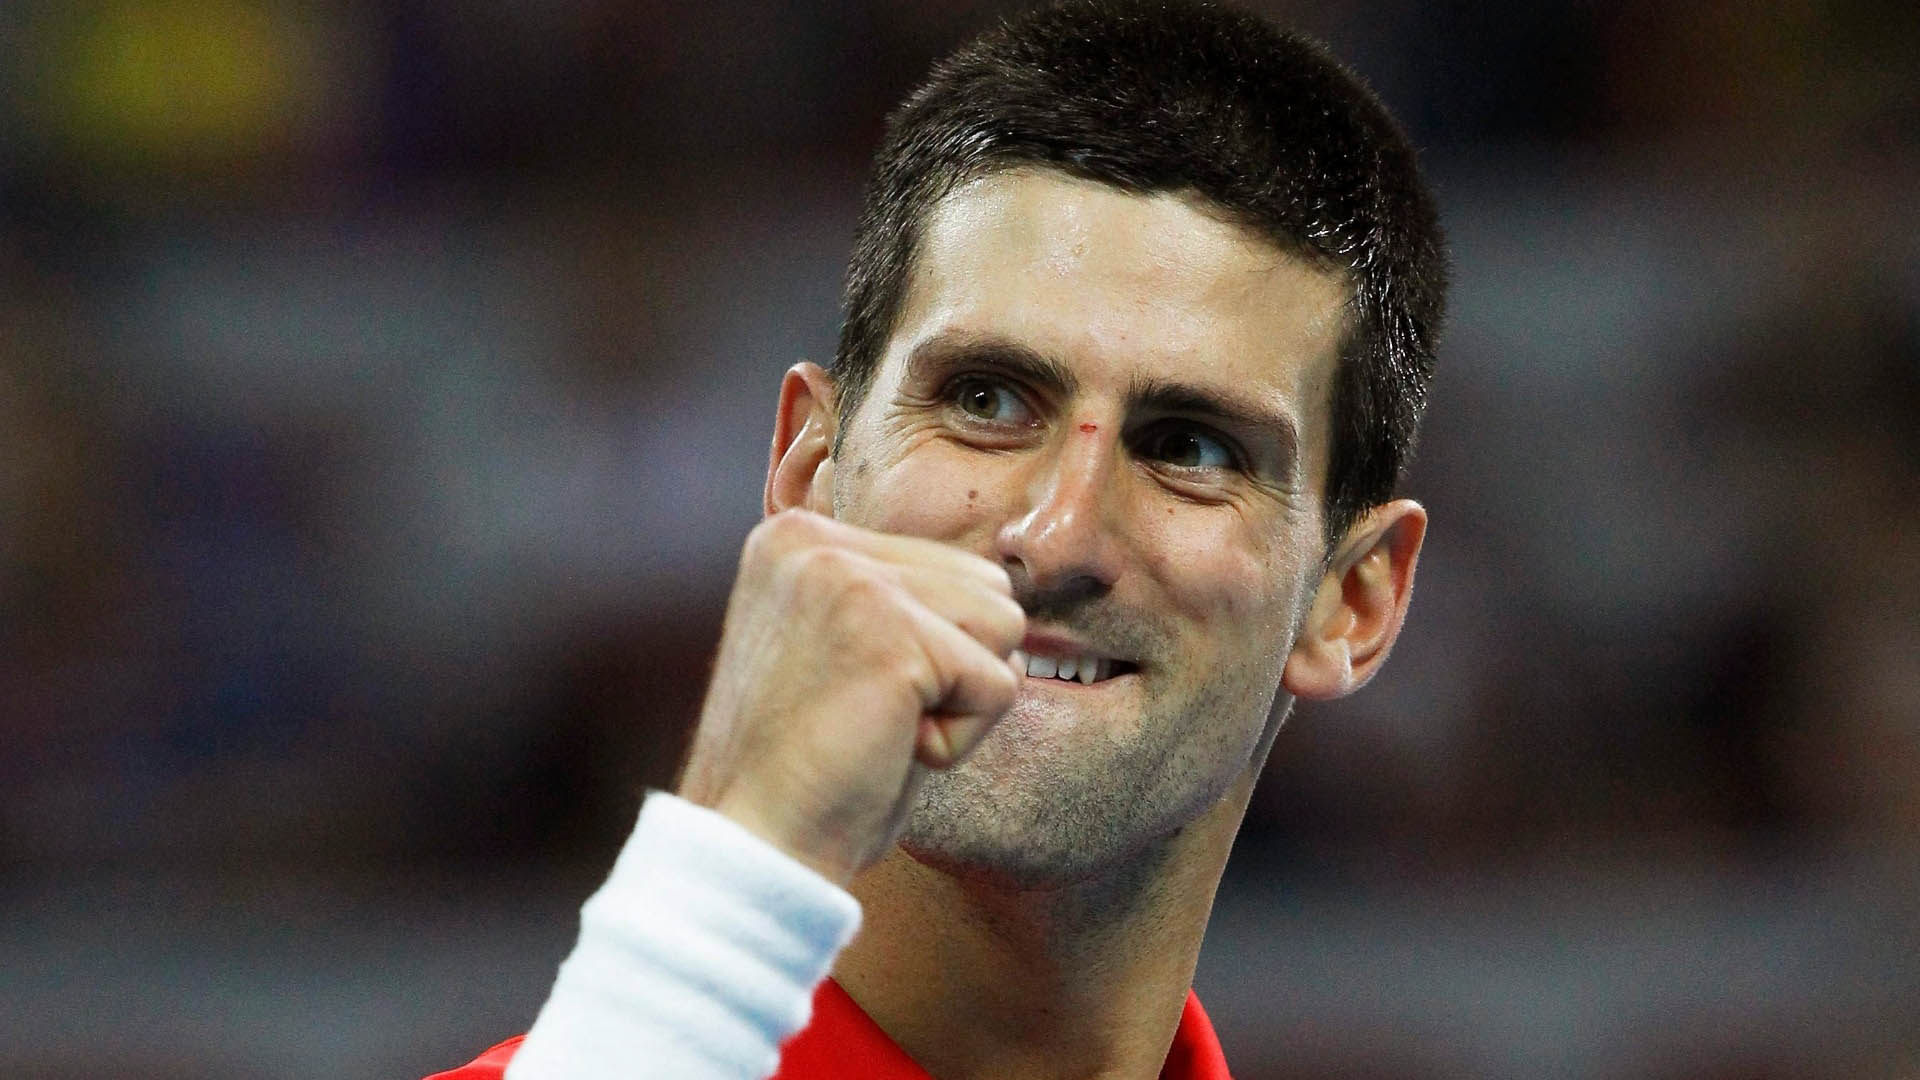 Novak Djokovic Wallpaper 5